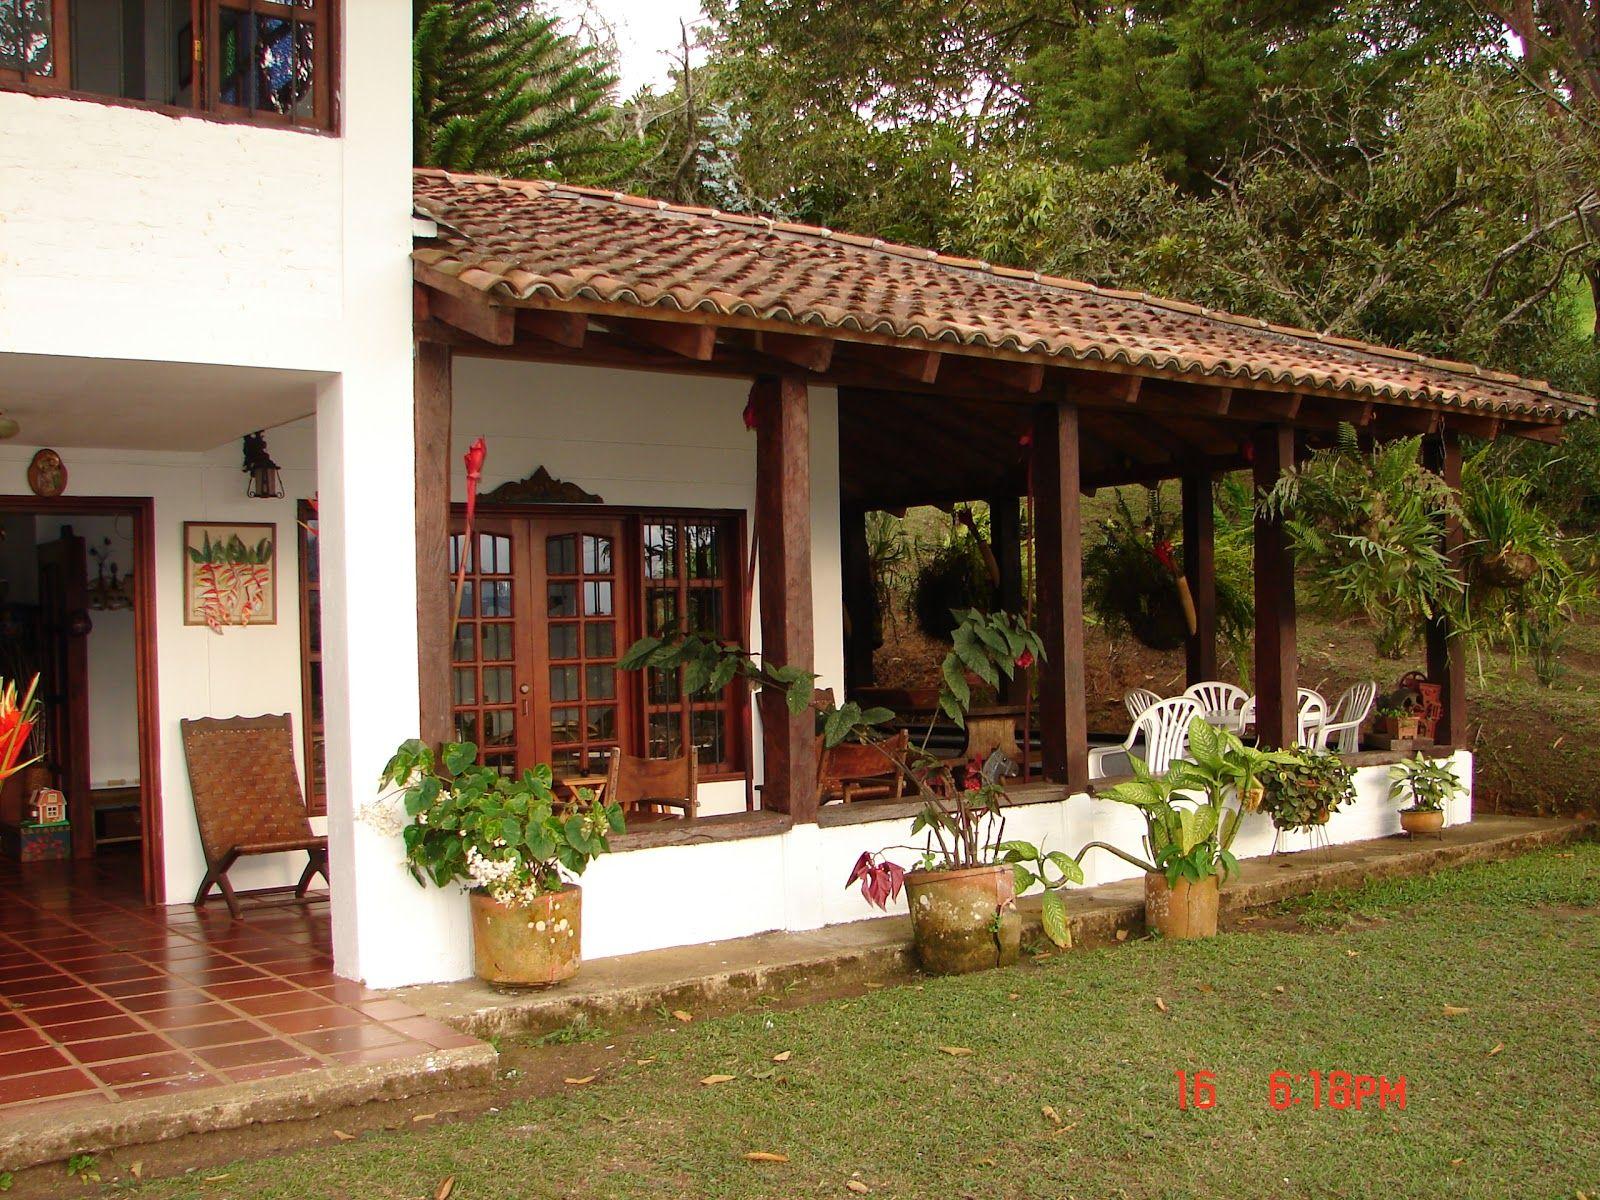 Casas campestres buscar con google ideas para casa for Decoracion de casas tipo hacienda